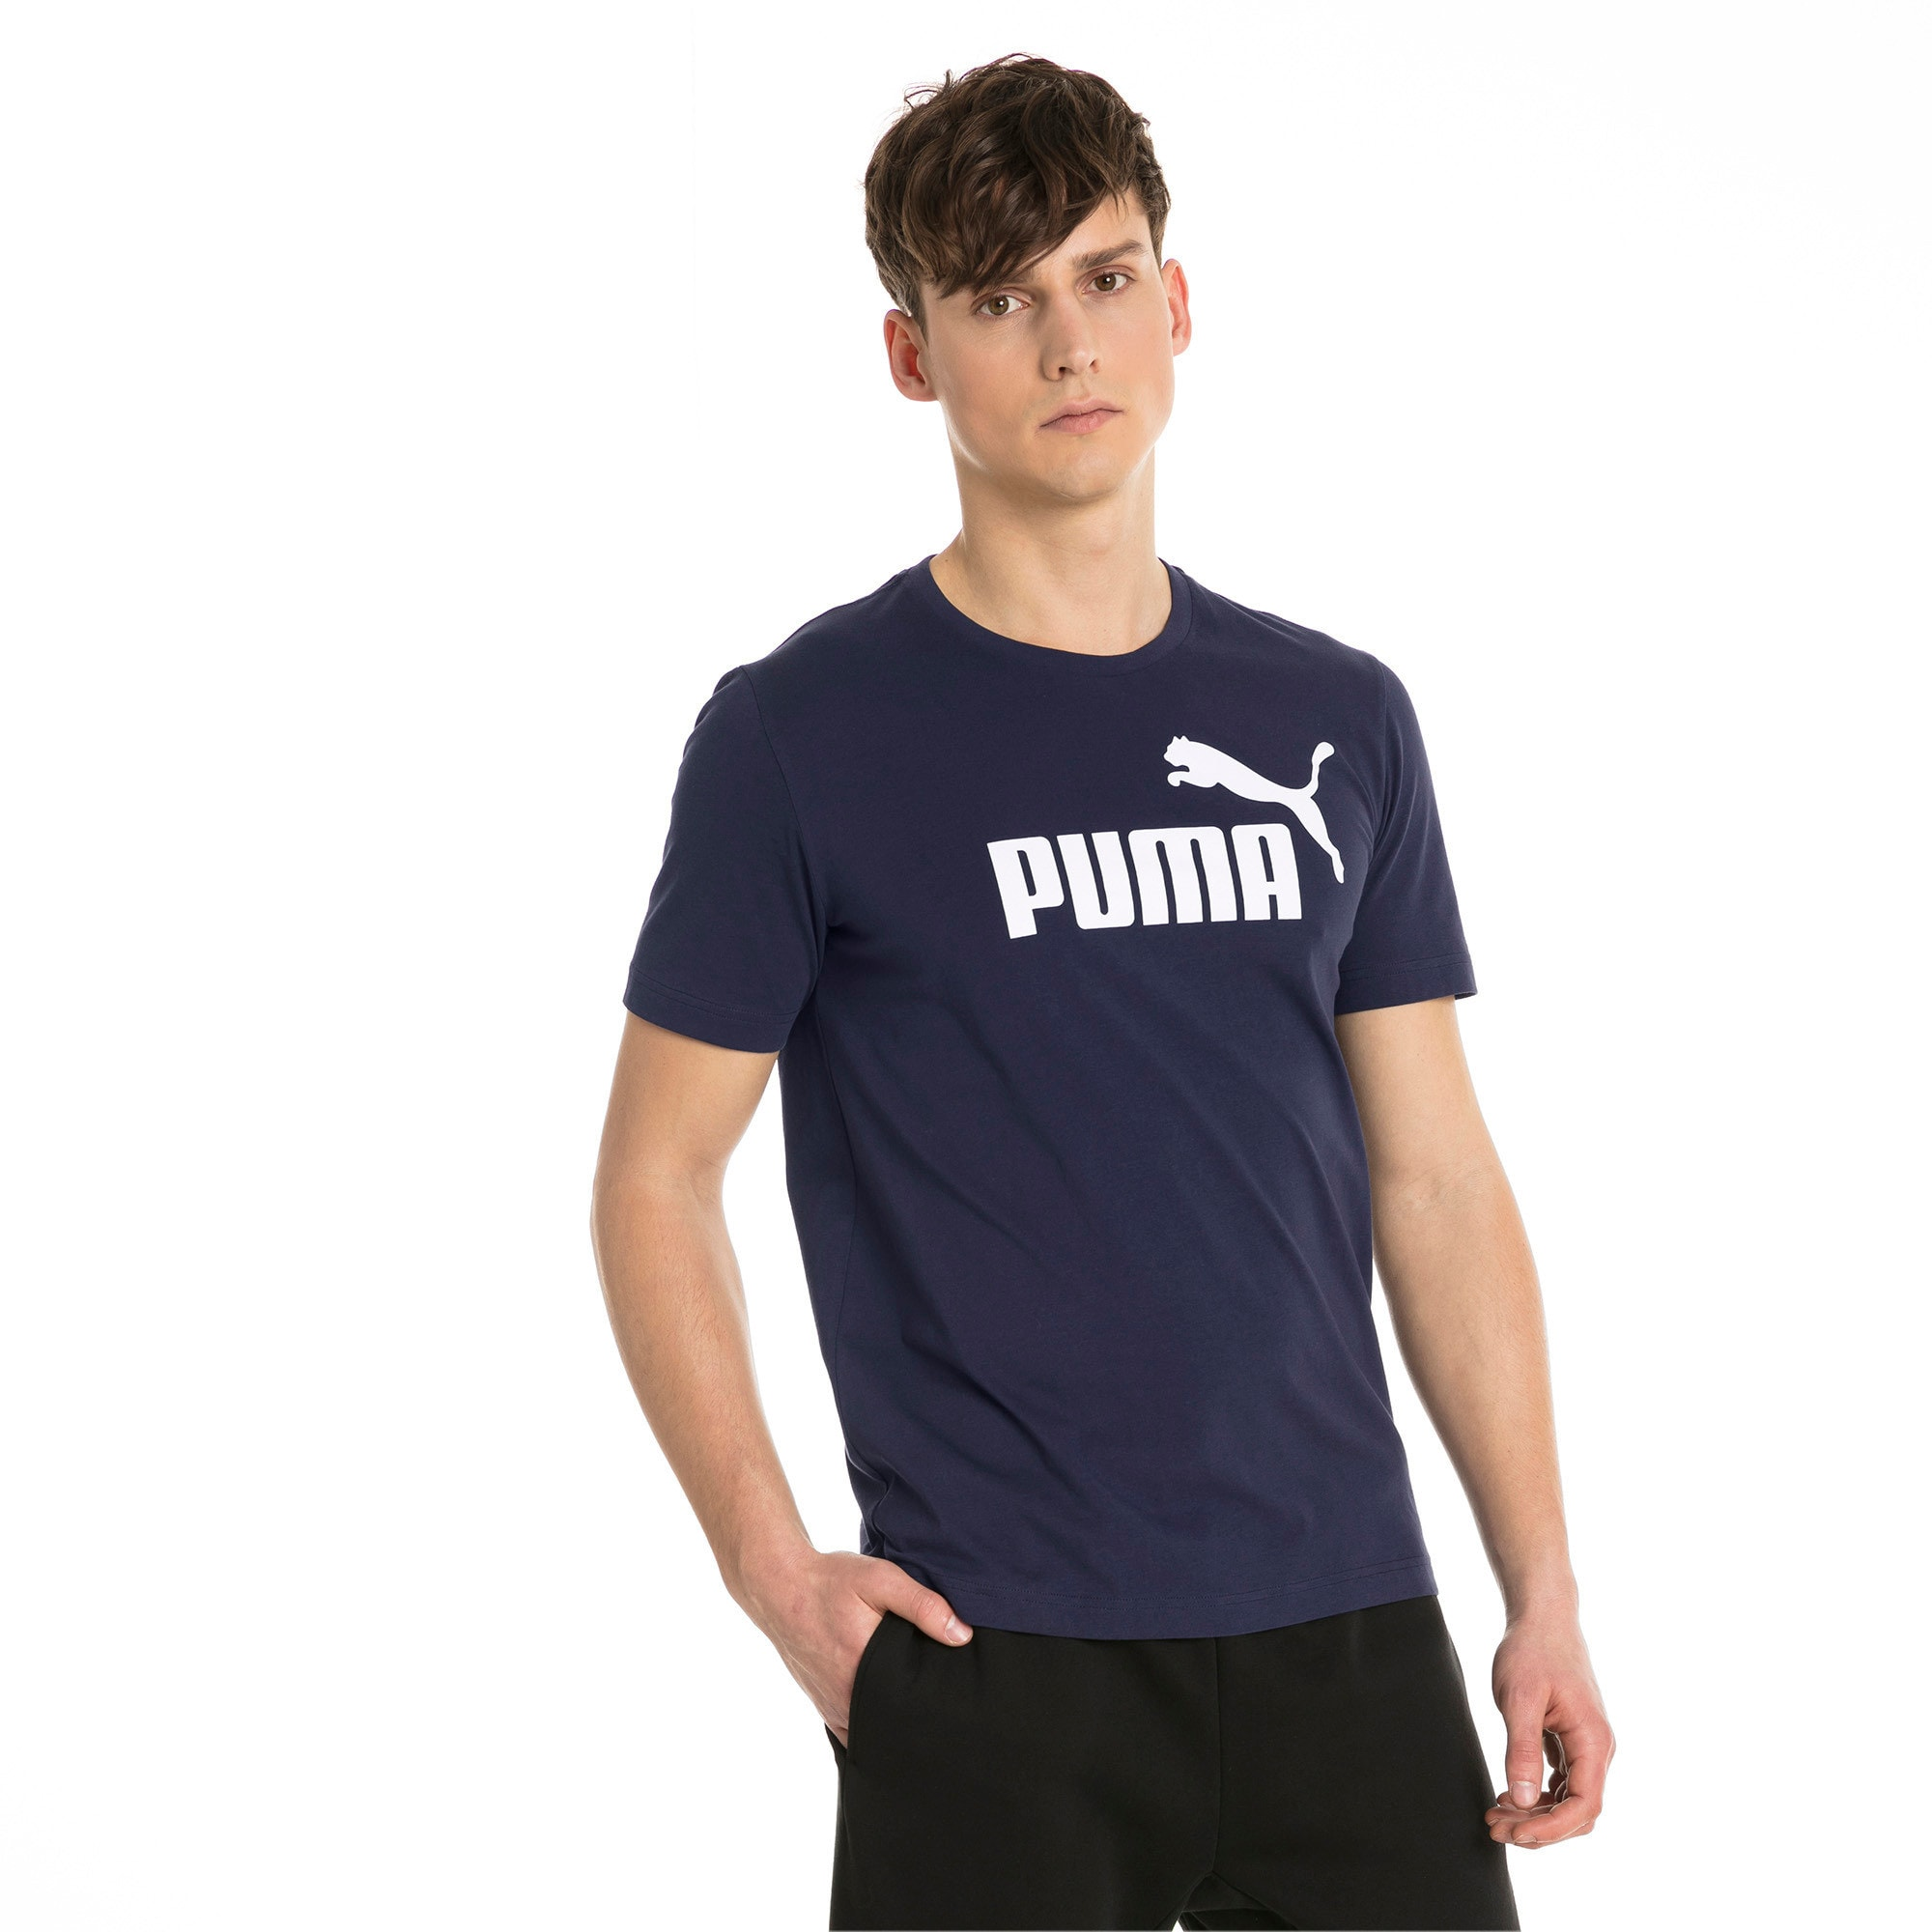 Thumbnail 1 of T-shirt a maniche corte Essentials uomo, Peacoat, medium